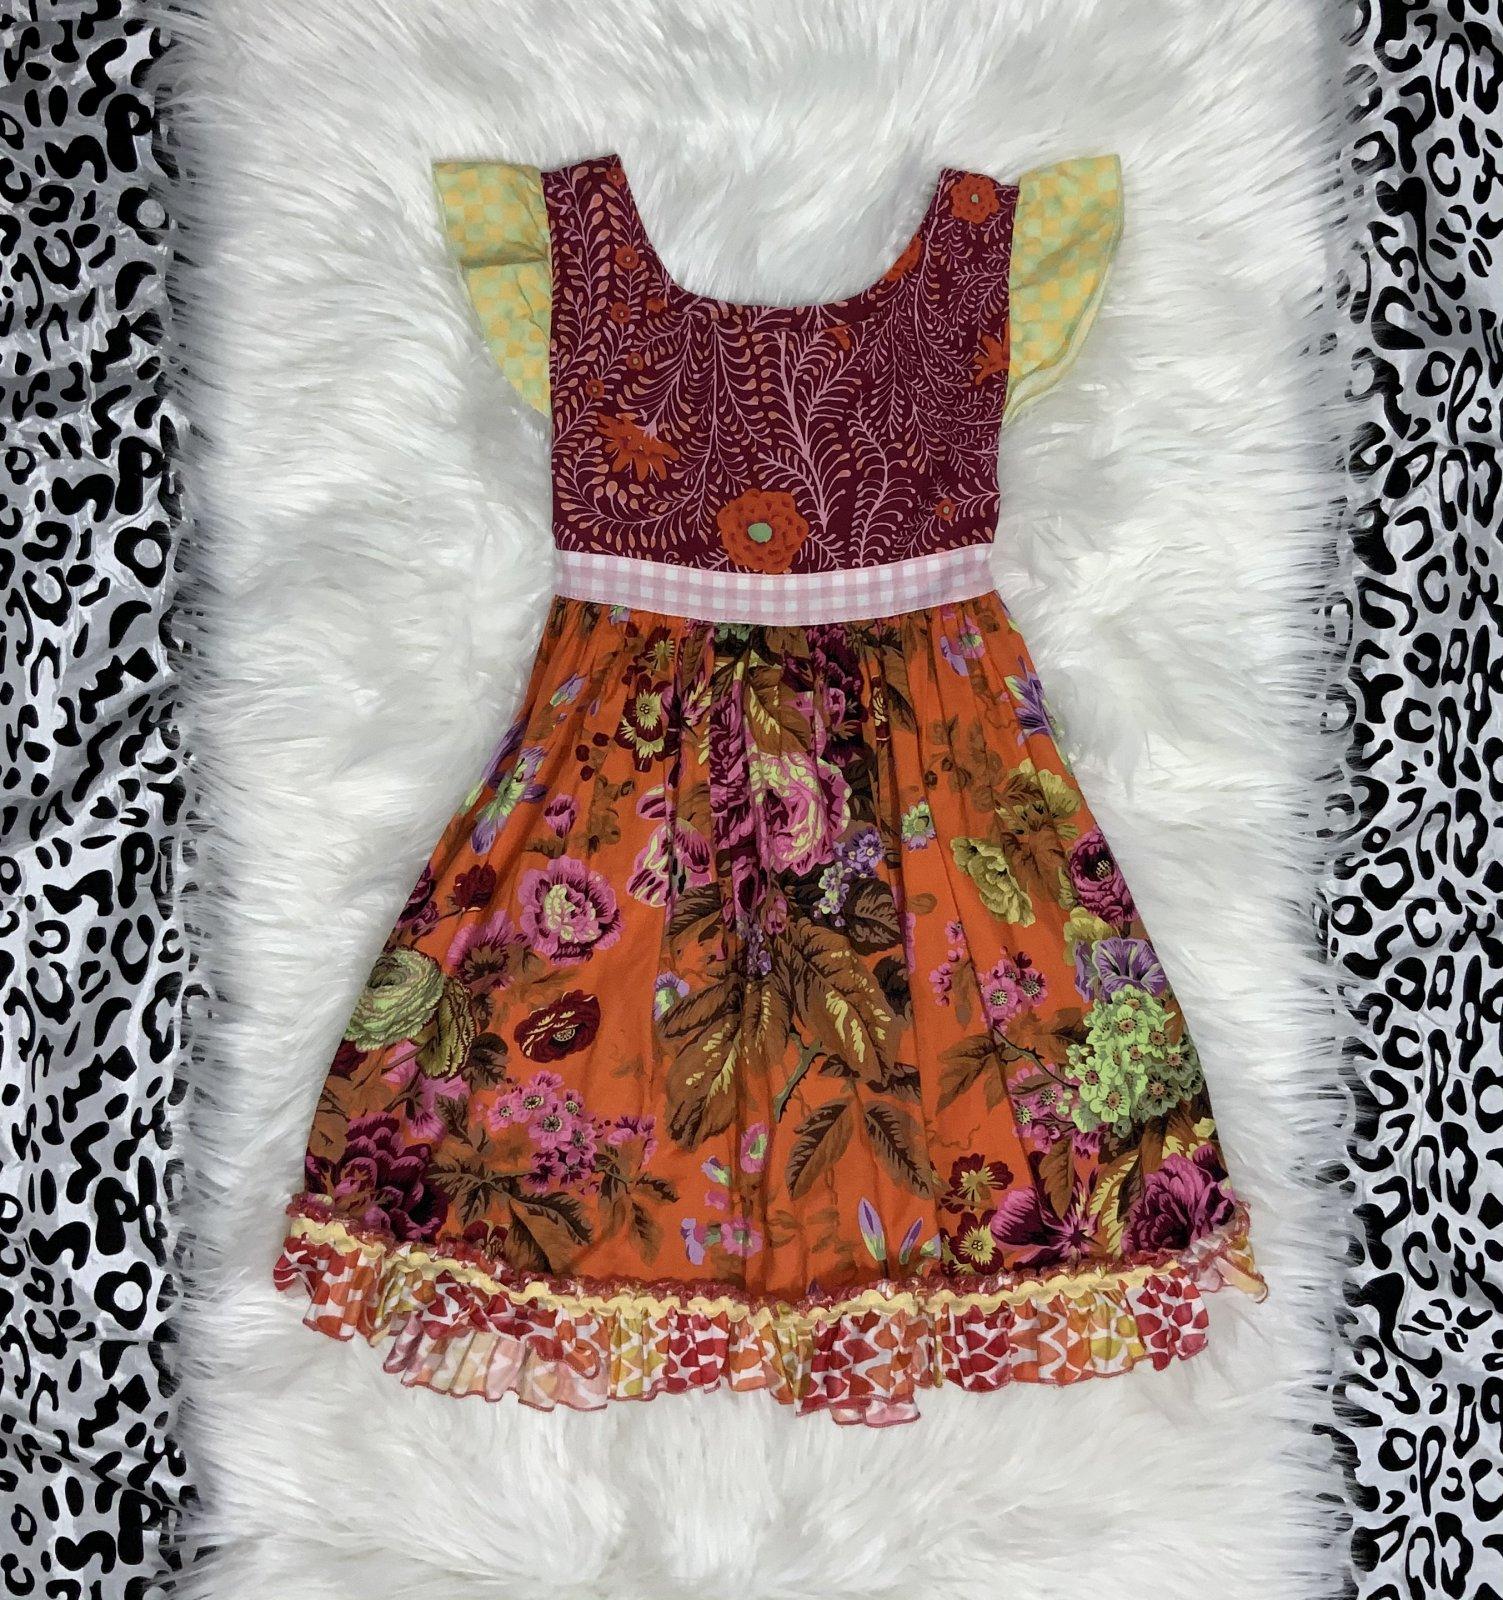 MATILDA JANE DRESS NS BURGANDY/ORANGE SIZE 8